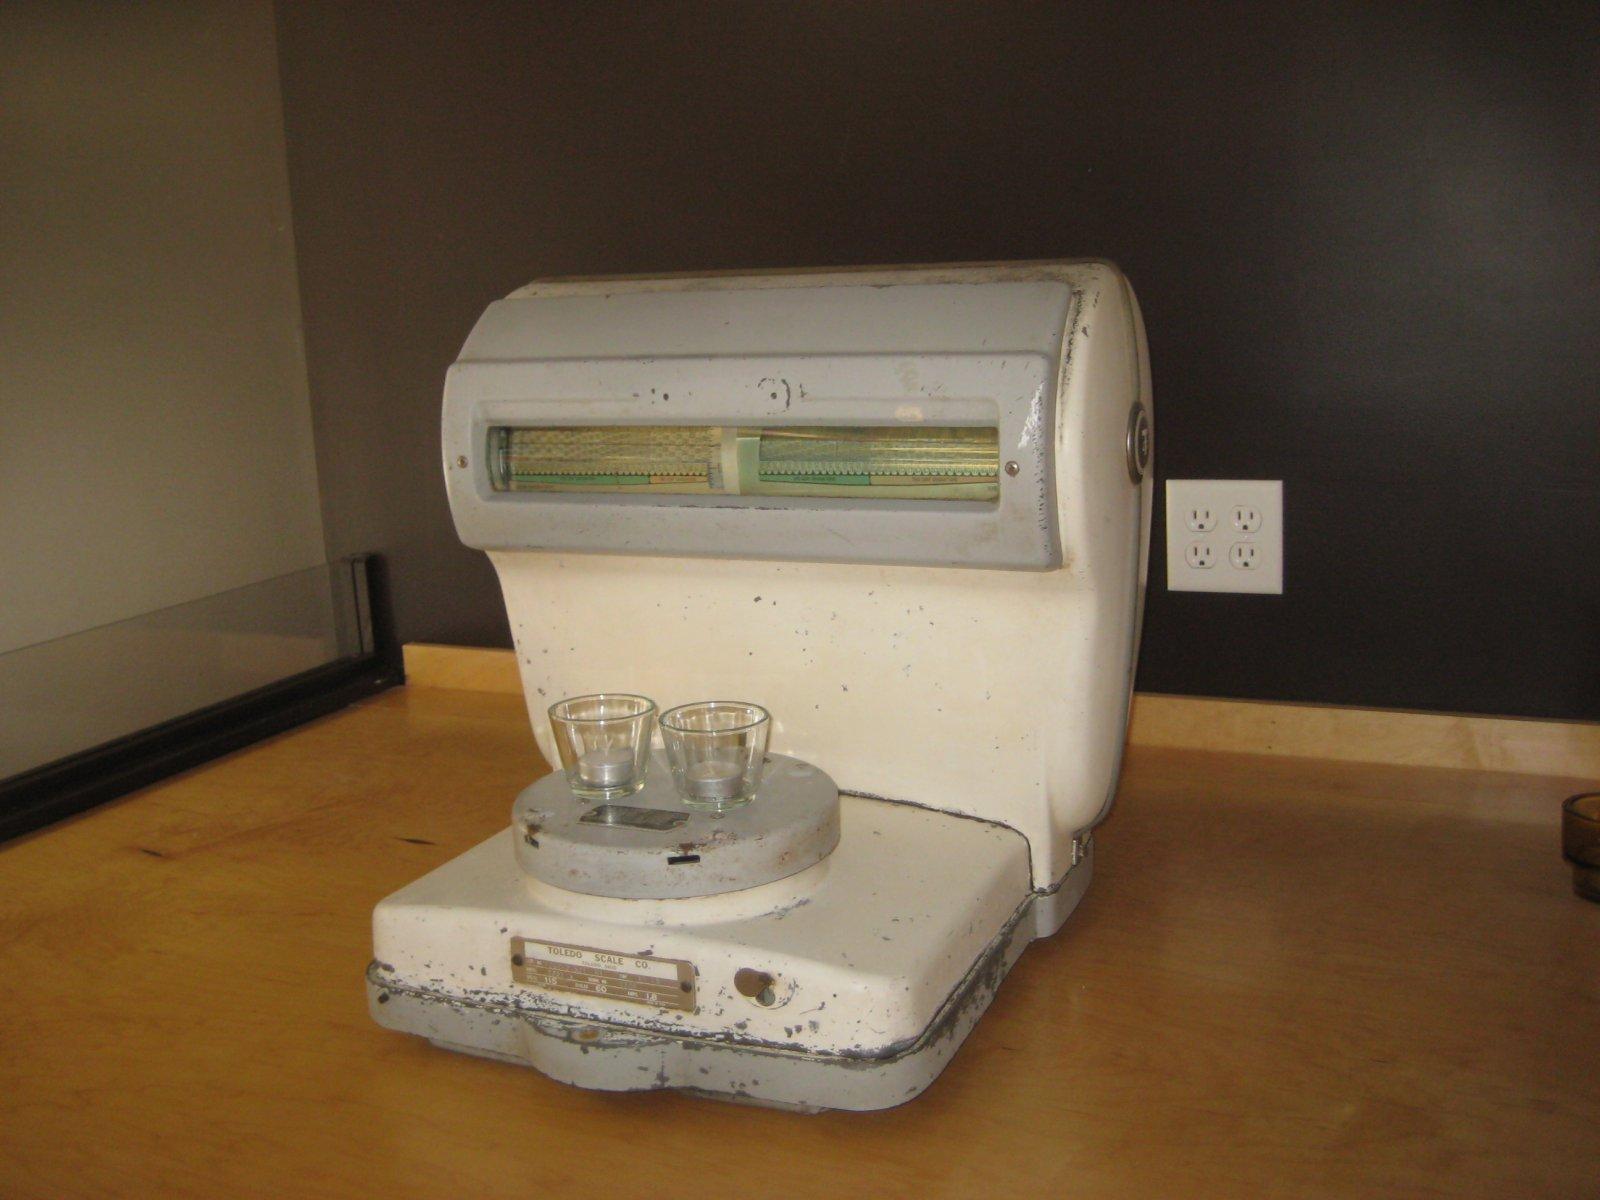 Toledo Scale Co. Model 1051A.